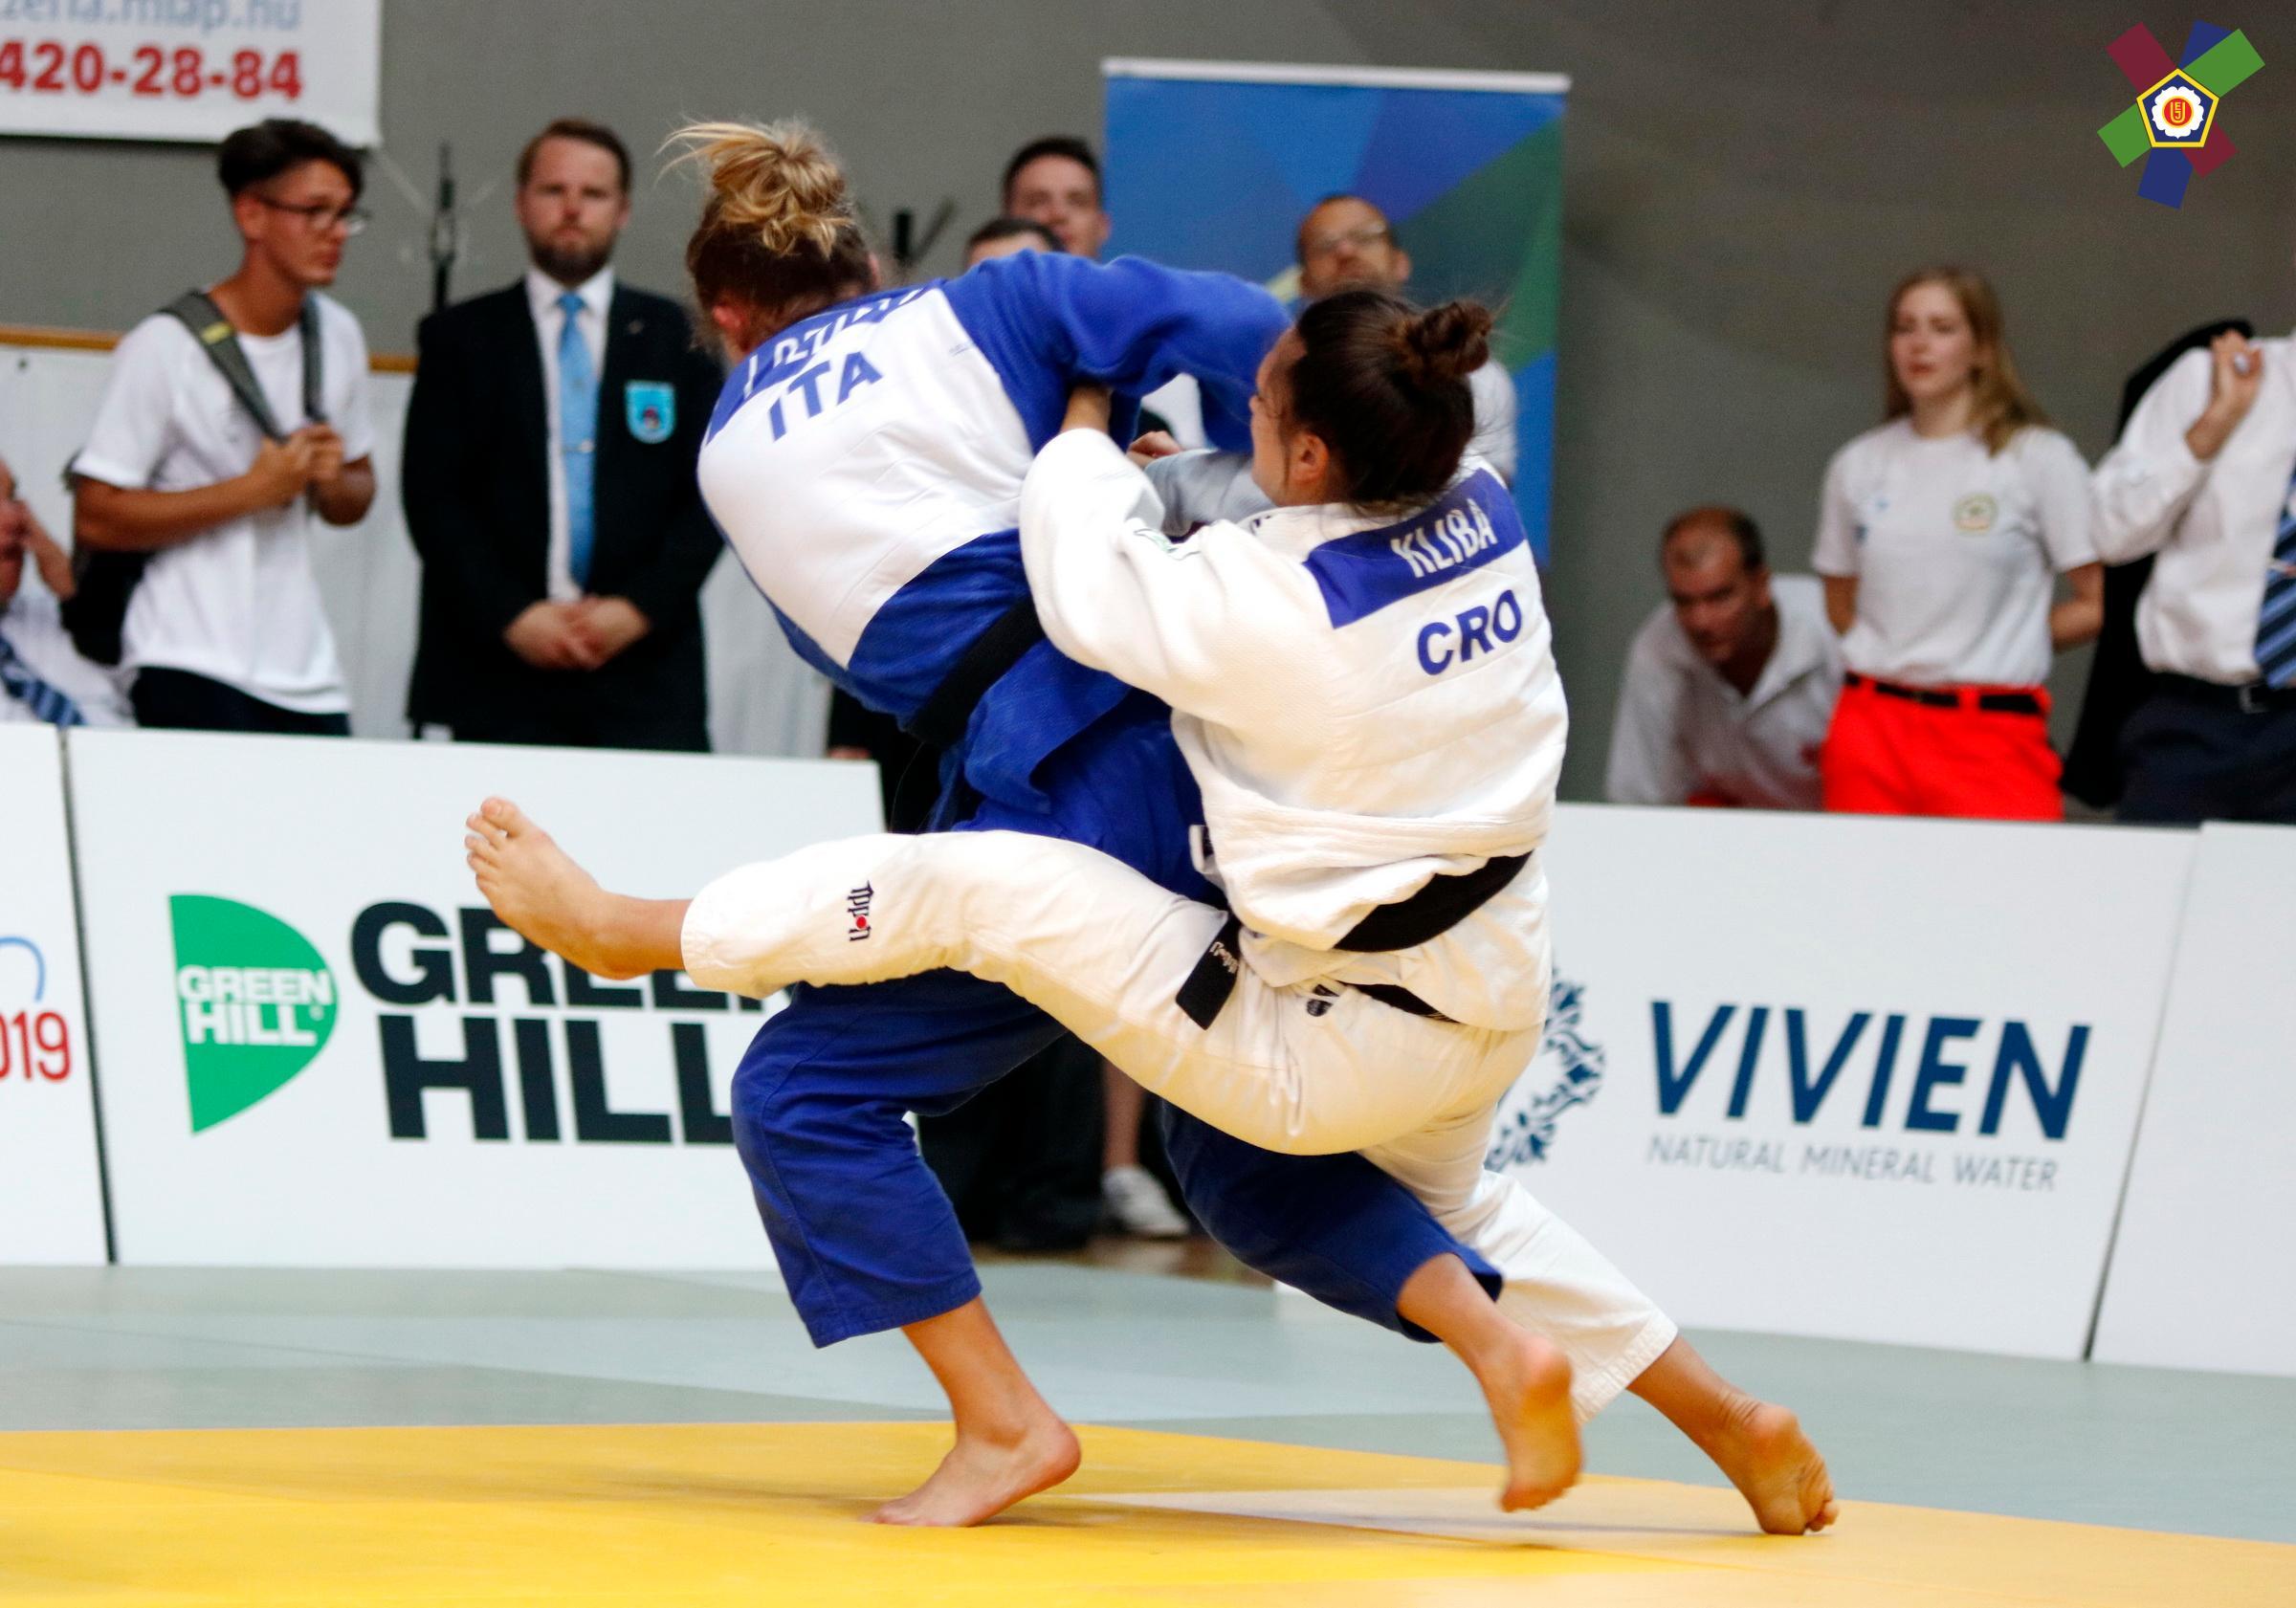 Judo-Junior-European-cup-Paks-2019-KLIBA-Lara-1